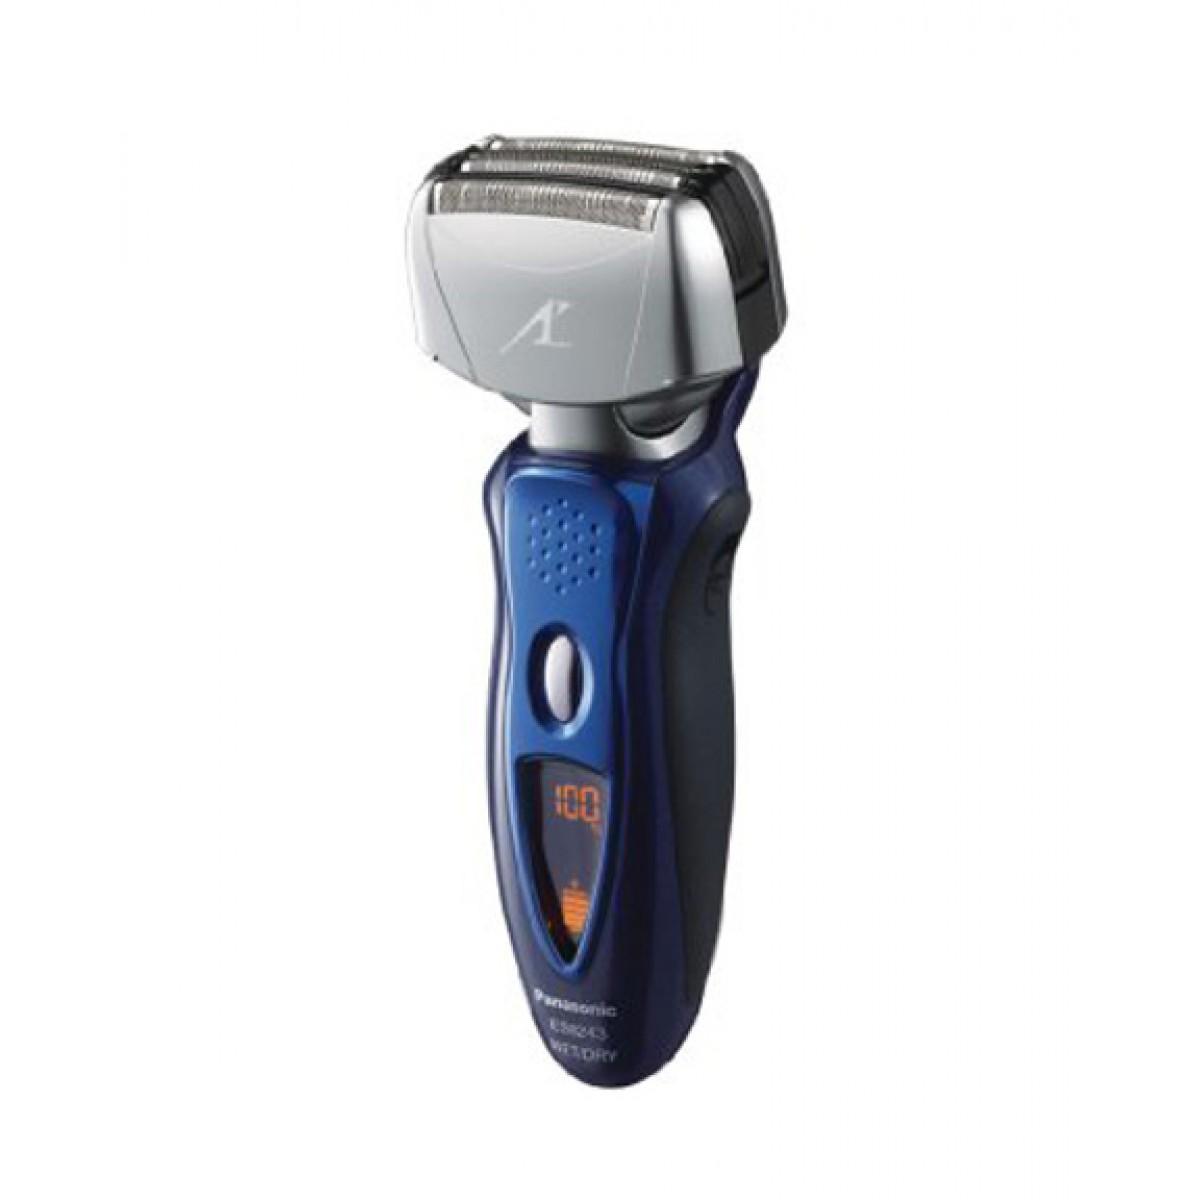 Panasonic ARC 4 4-Blade Rechargeable Shaver (ES8243A)